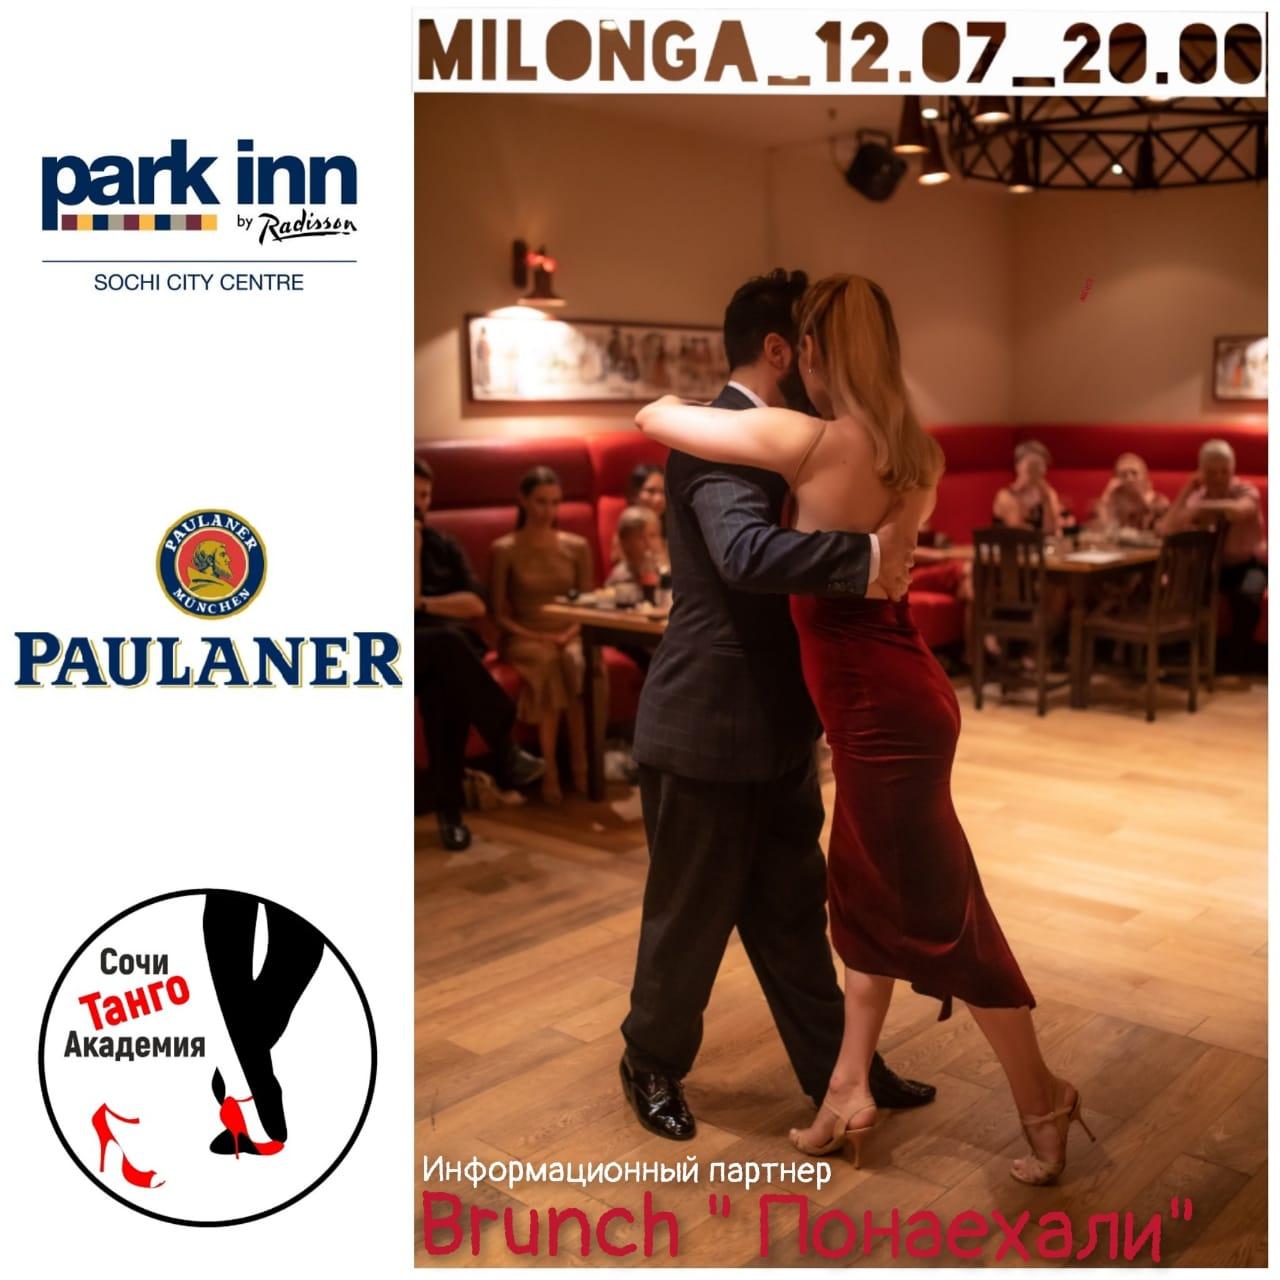 Милонга 12.07.2020 г. в Park inn by Radisson Sochi city centre, ресторан Paulaner.